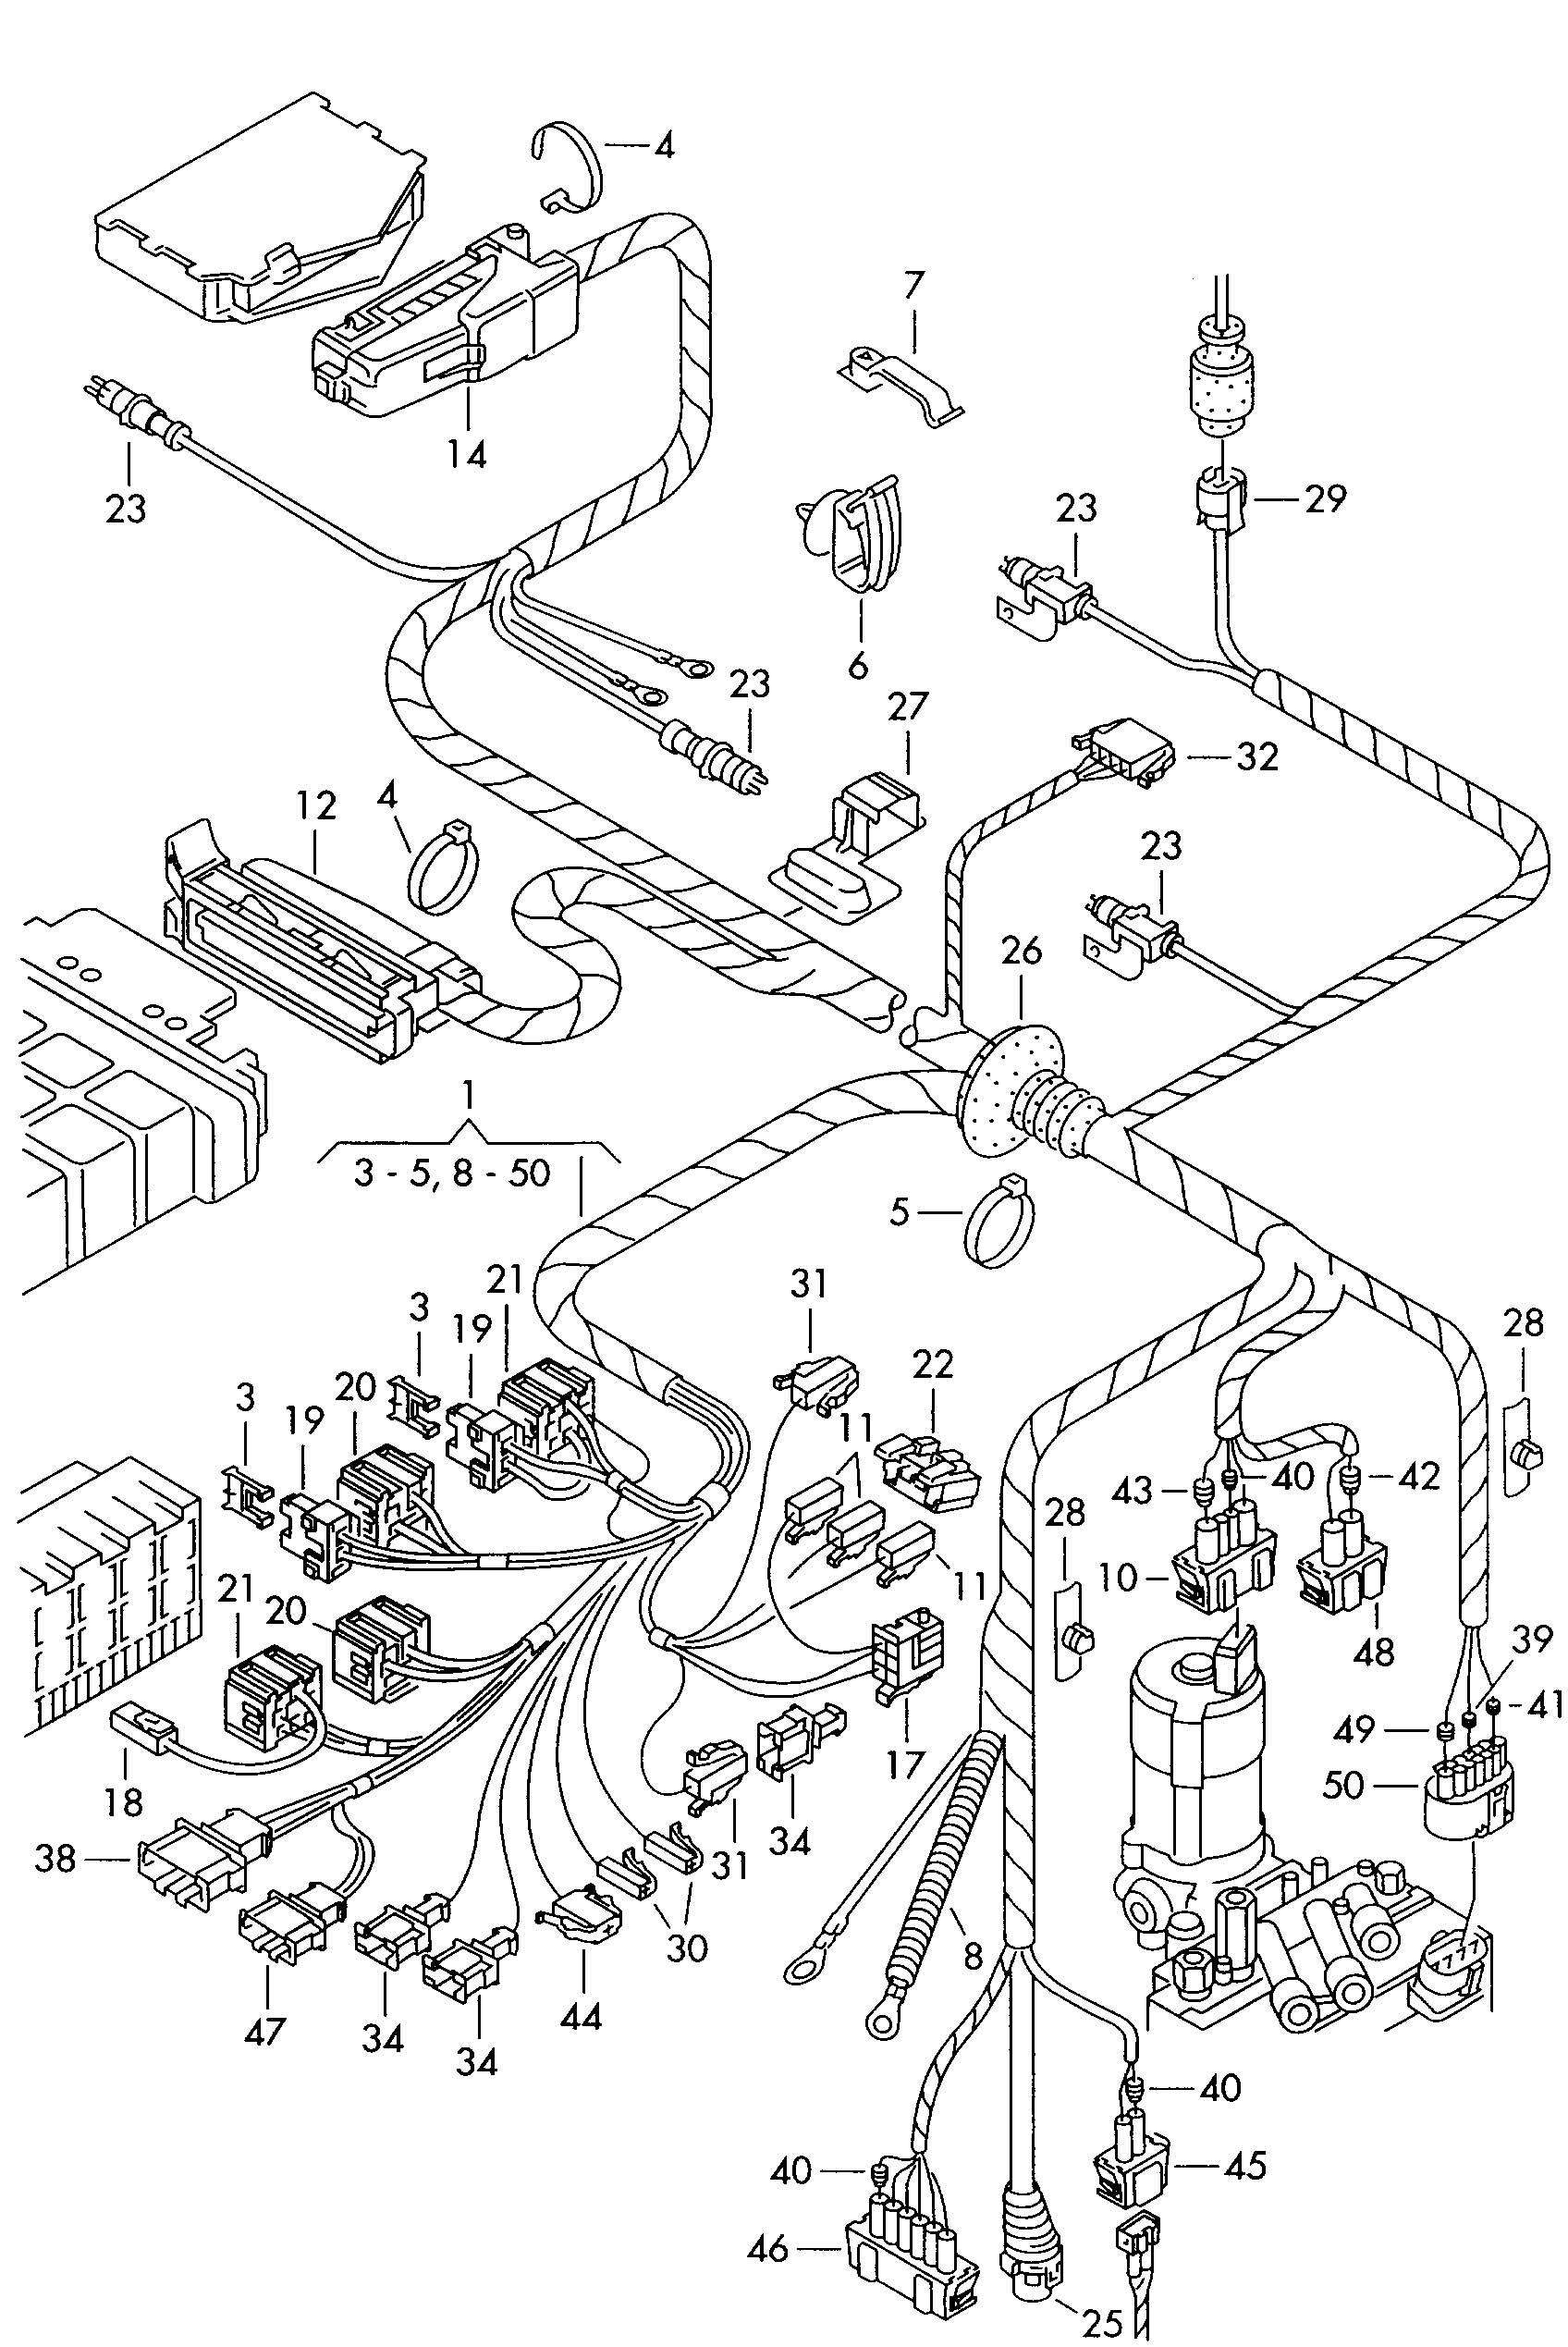 Diagram Volkswagen Tiguan Engine Diagram Full